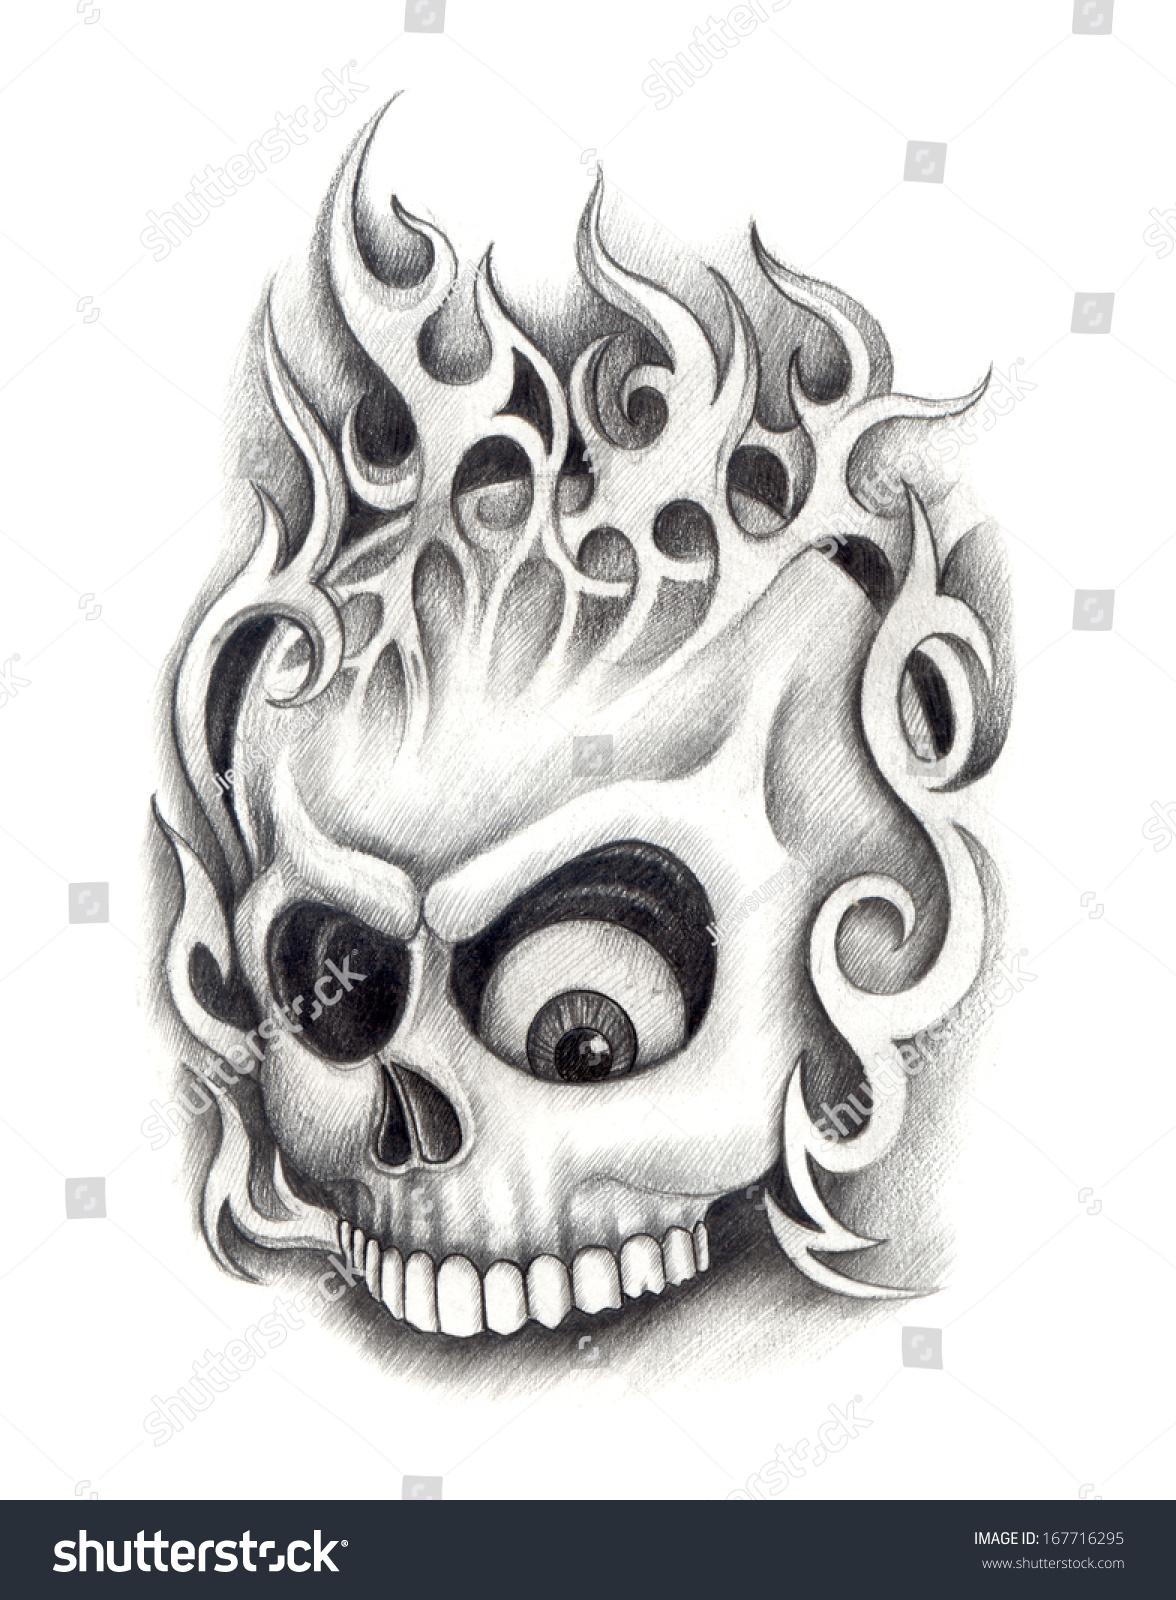 skull tattoo hand drawing on paper stock illustration 167716295 shutterstock. Black Bedroom Furniture Sets. Home Design Ideas